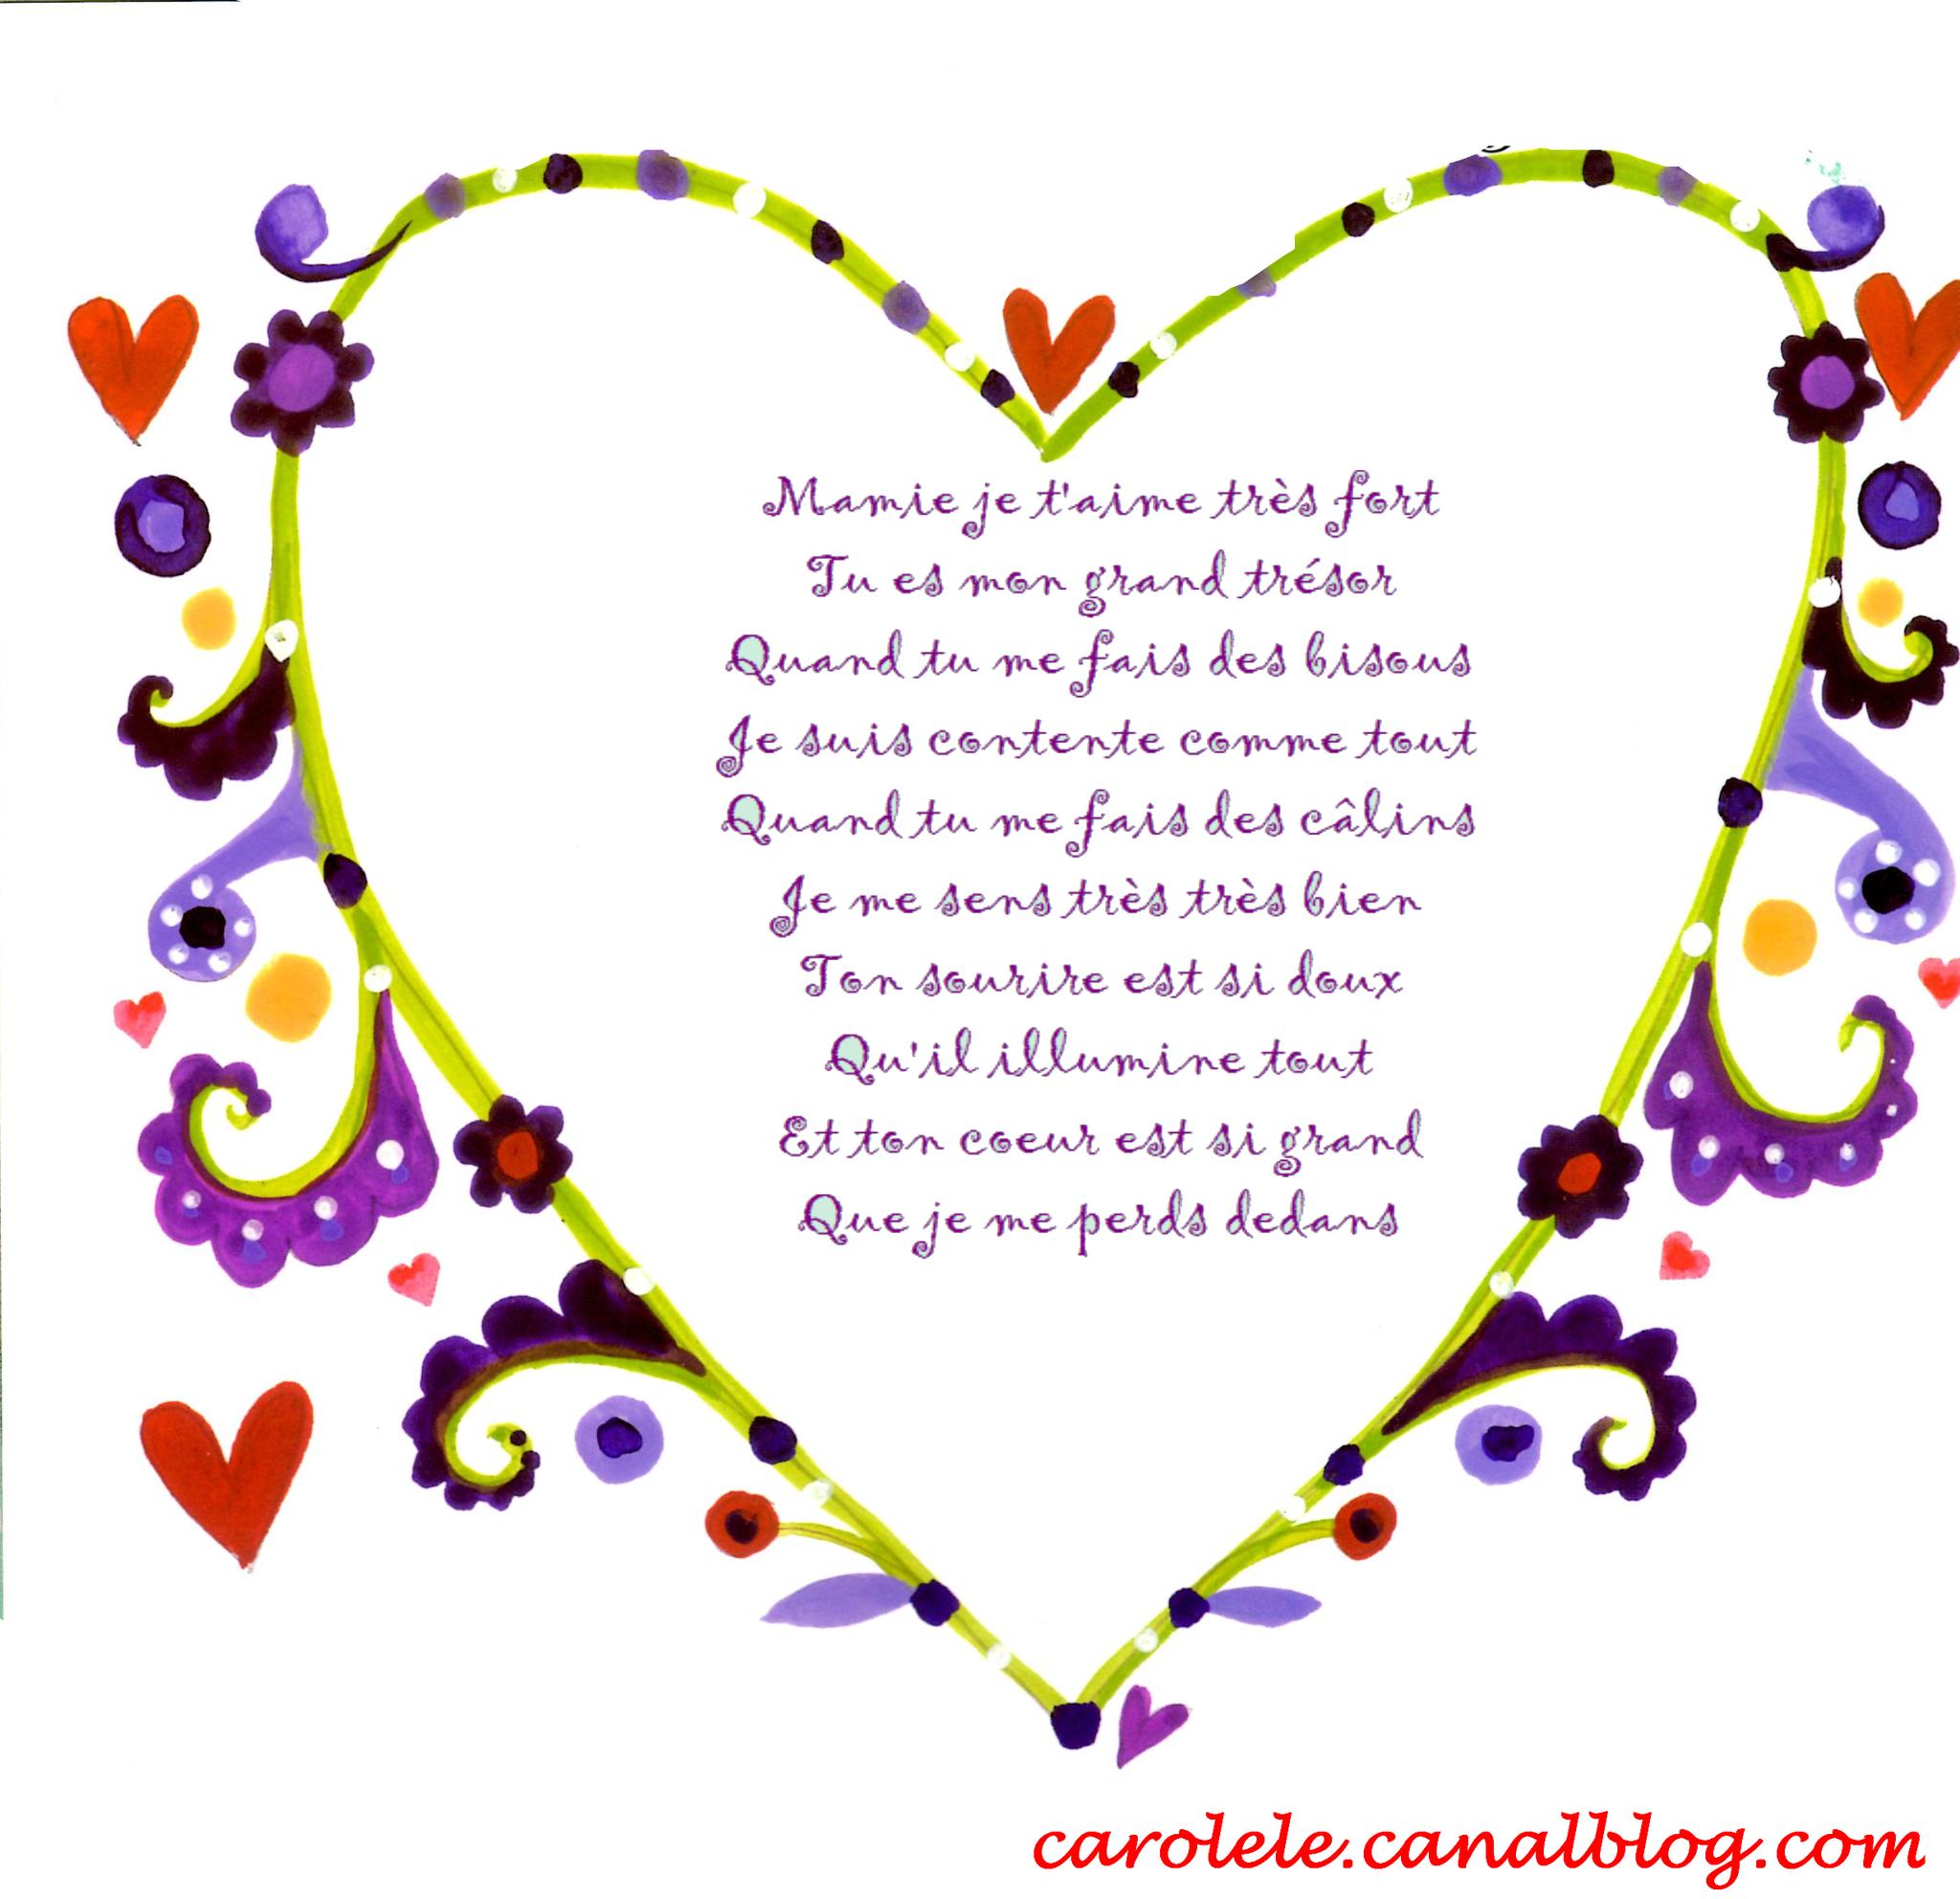 Proverbe Damour Pour Sa Maman Texte Anniversaire 18 Ans